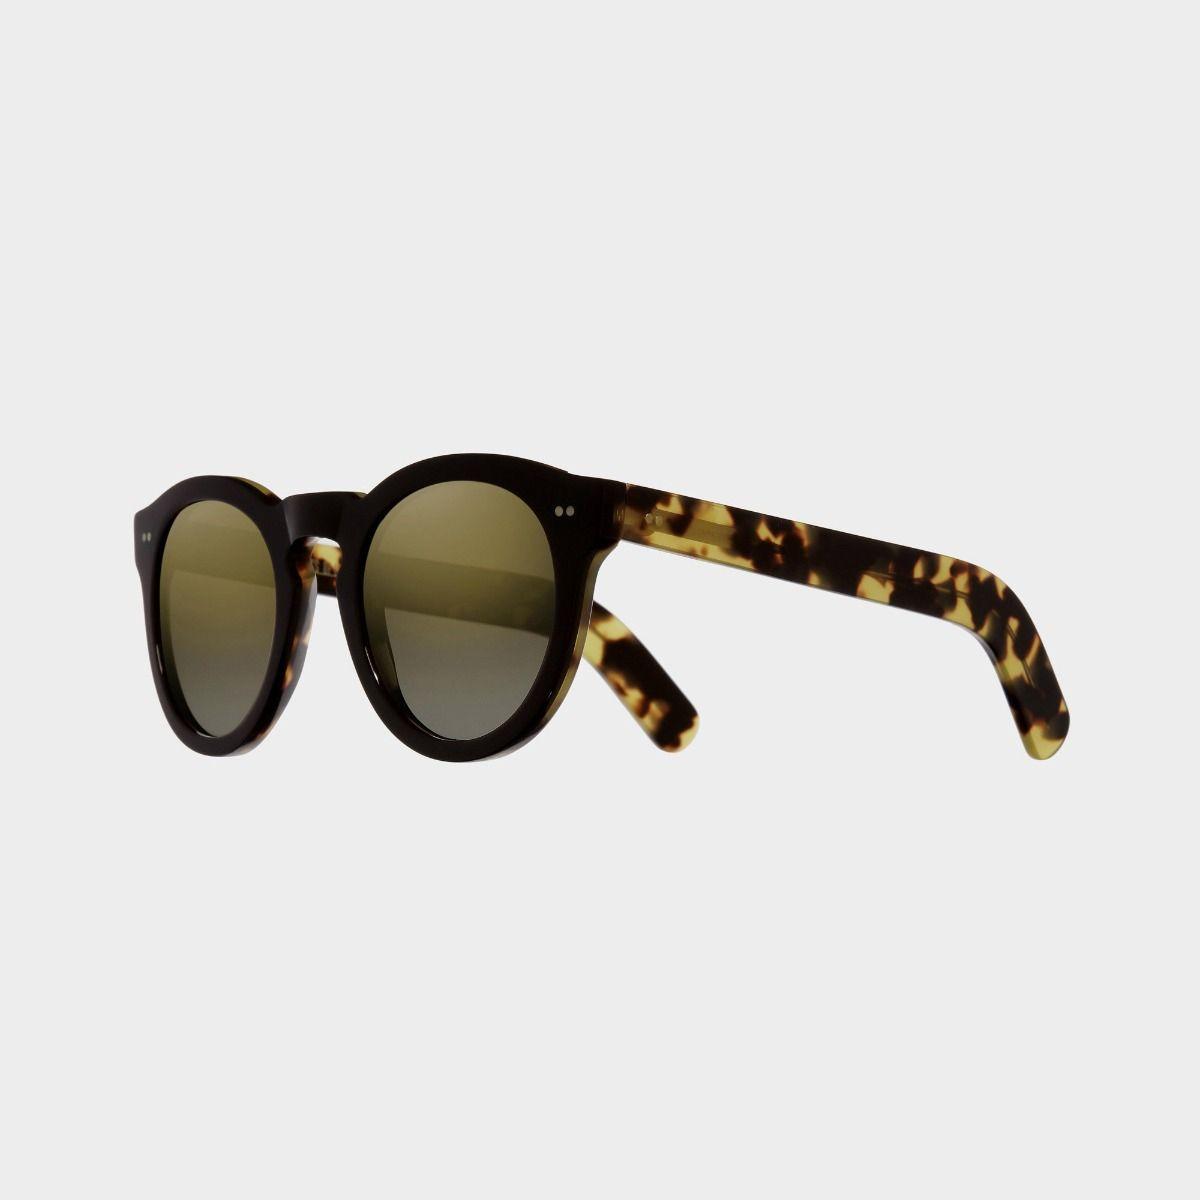 0734V2 Round Sunglasses (Small)-Black on Camo